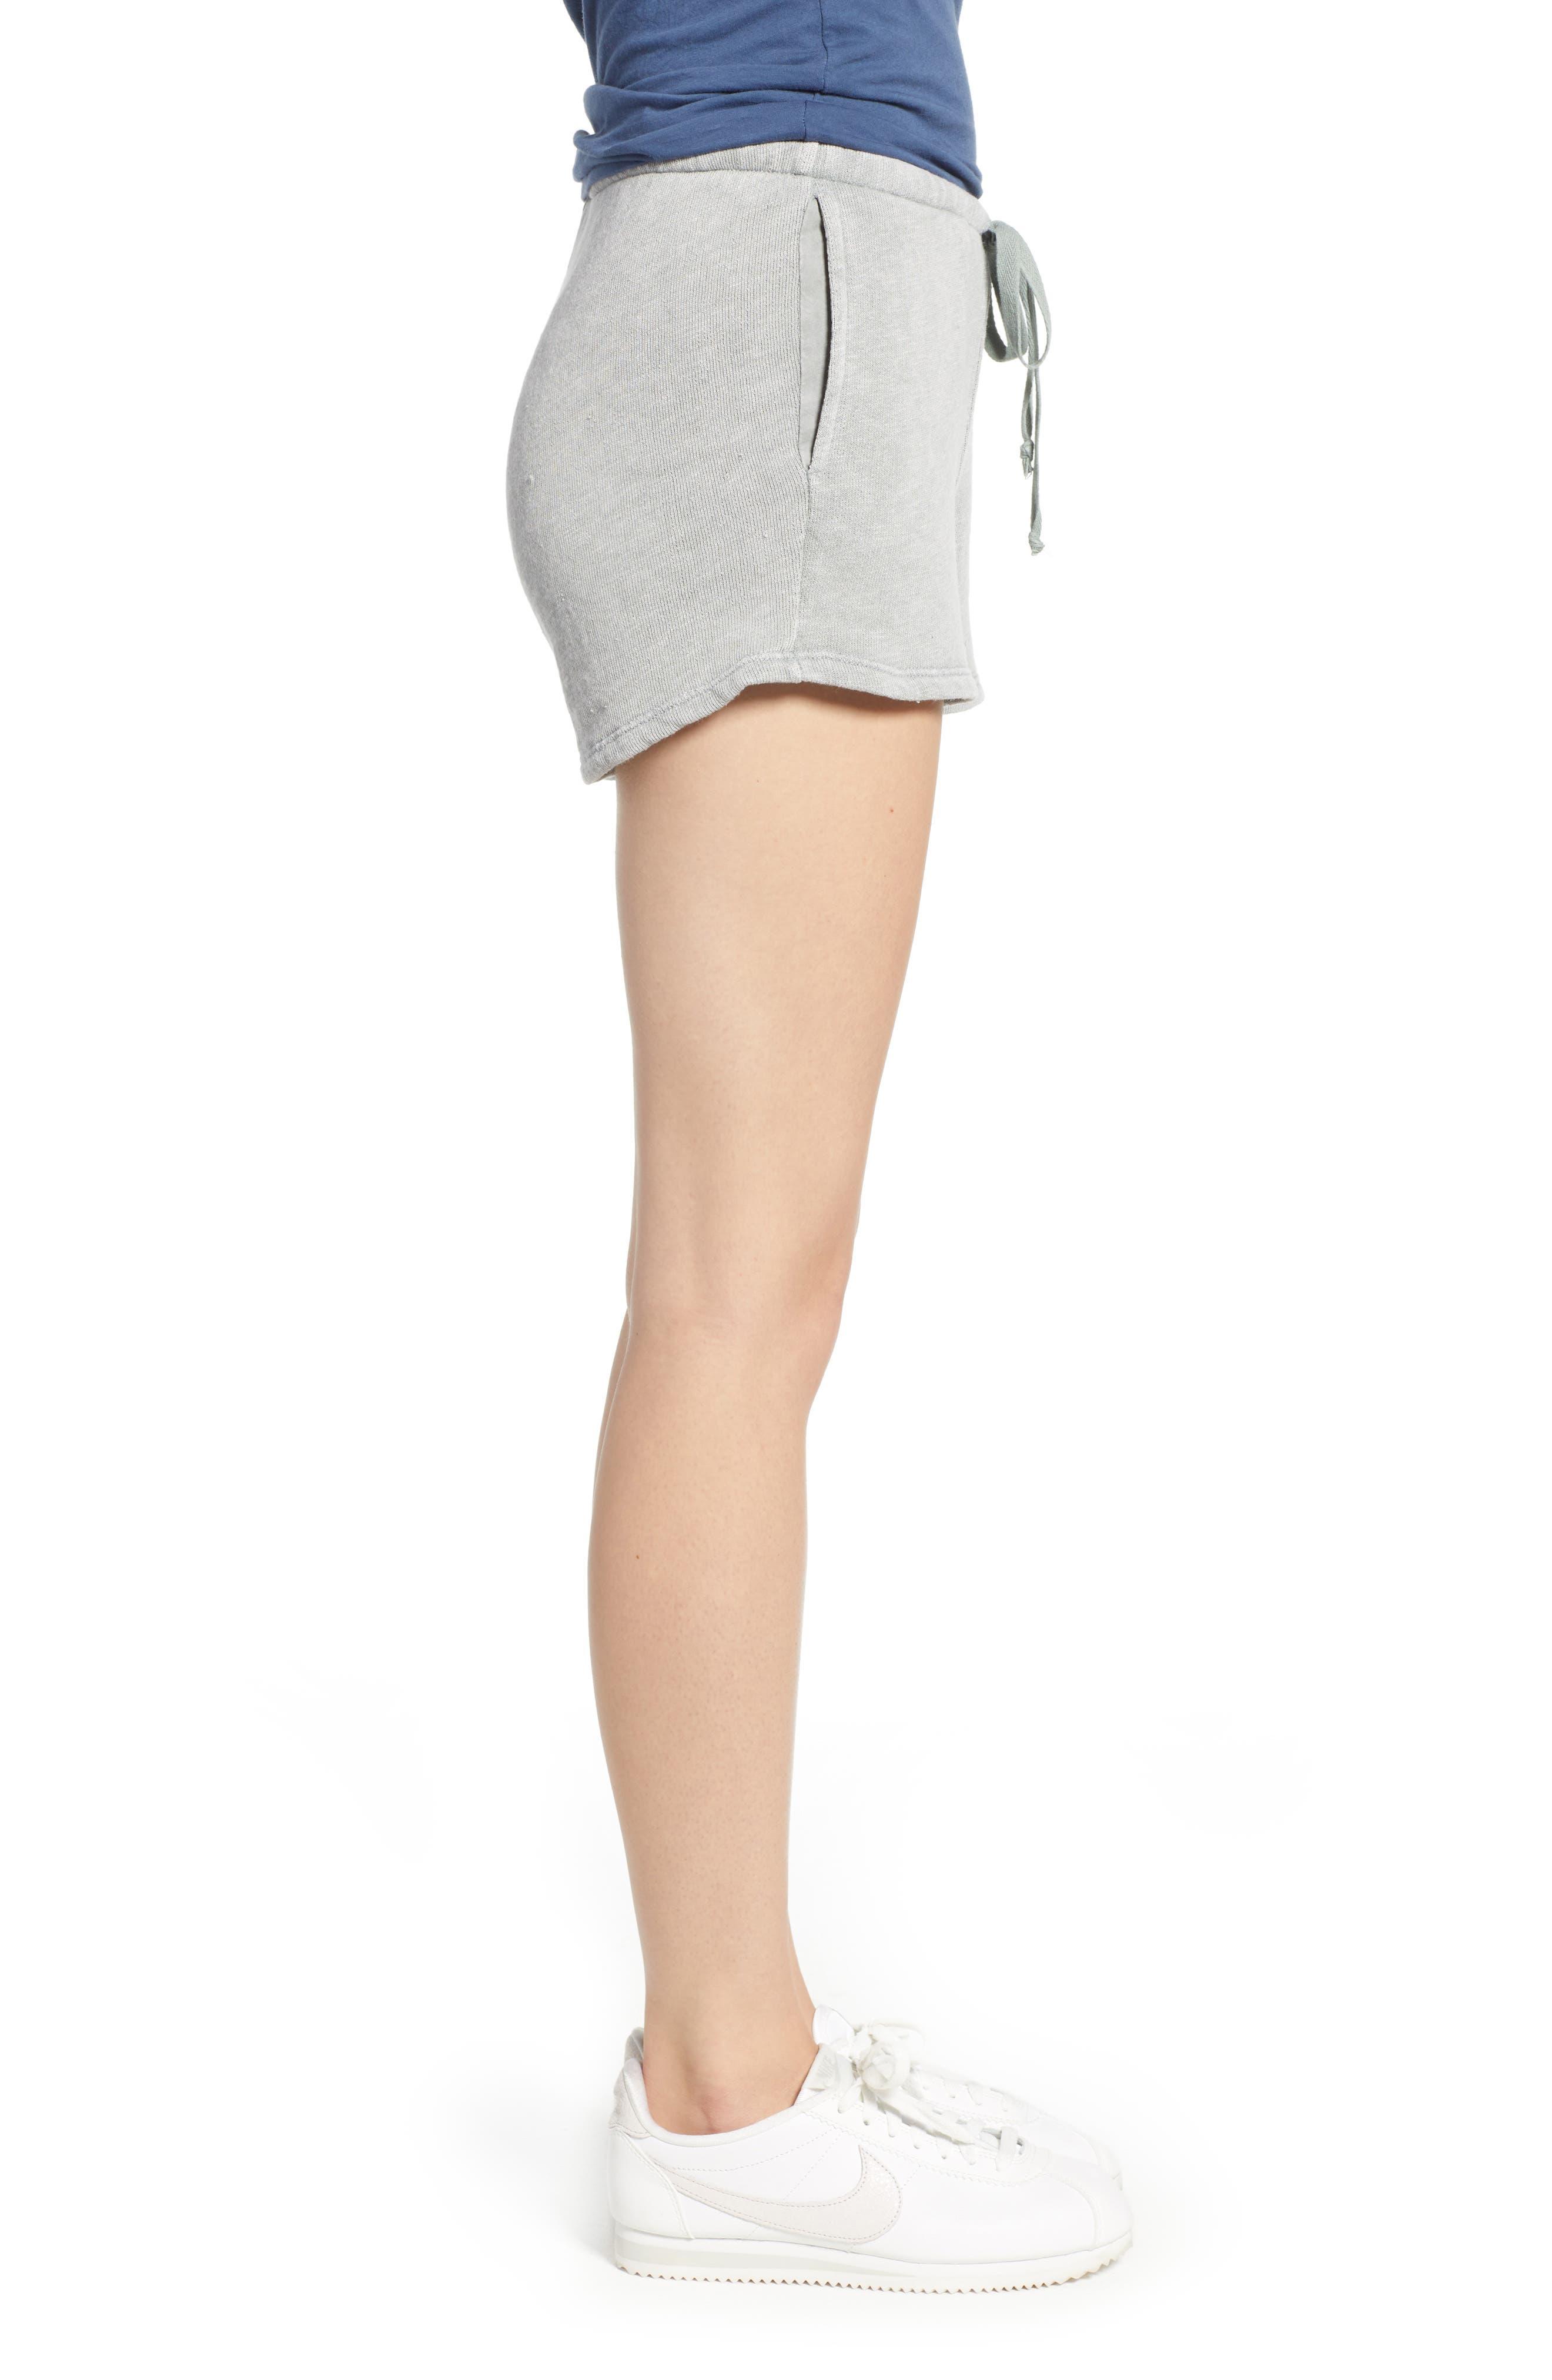 Kiama Shorts,                             Alternate thumbnail 3, color,                             FADED MOSS